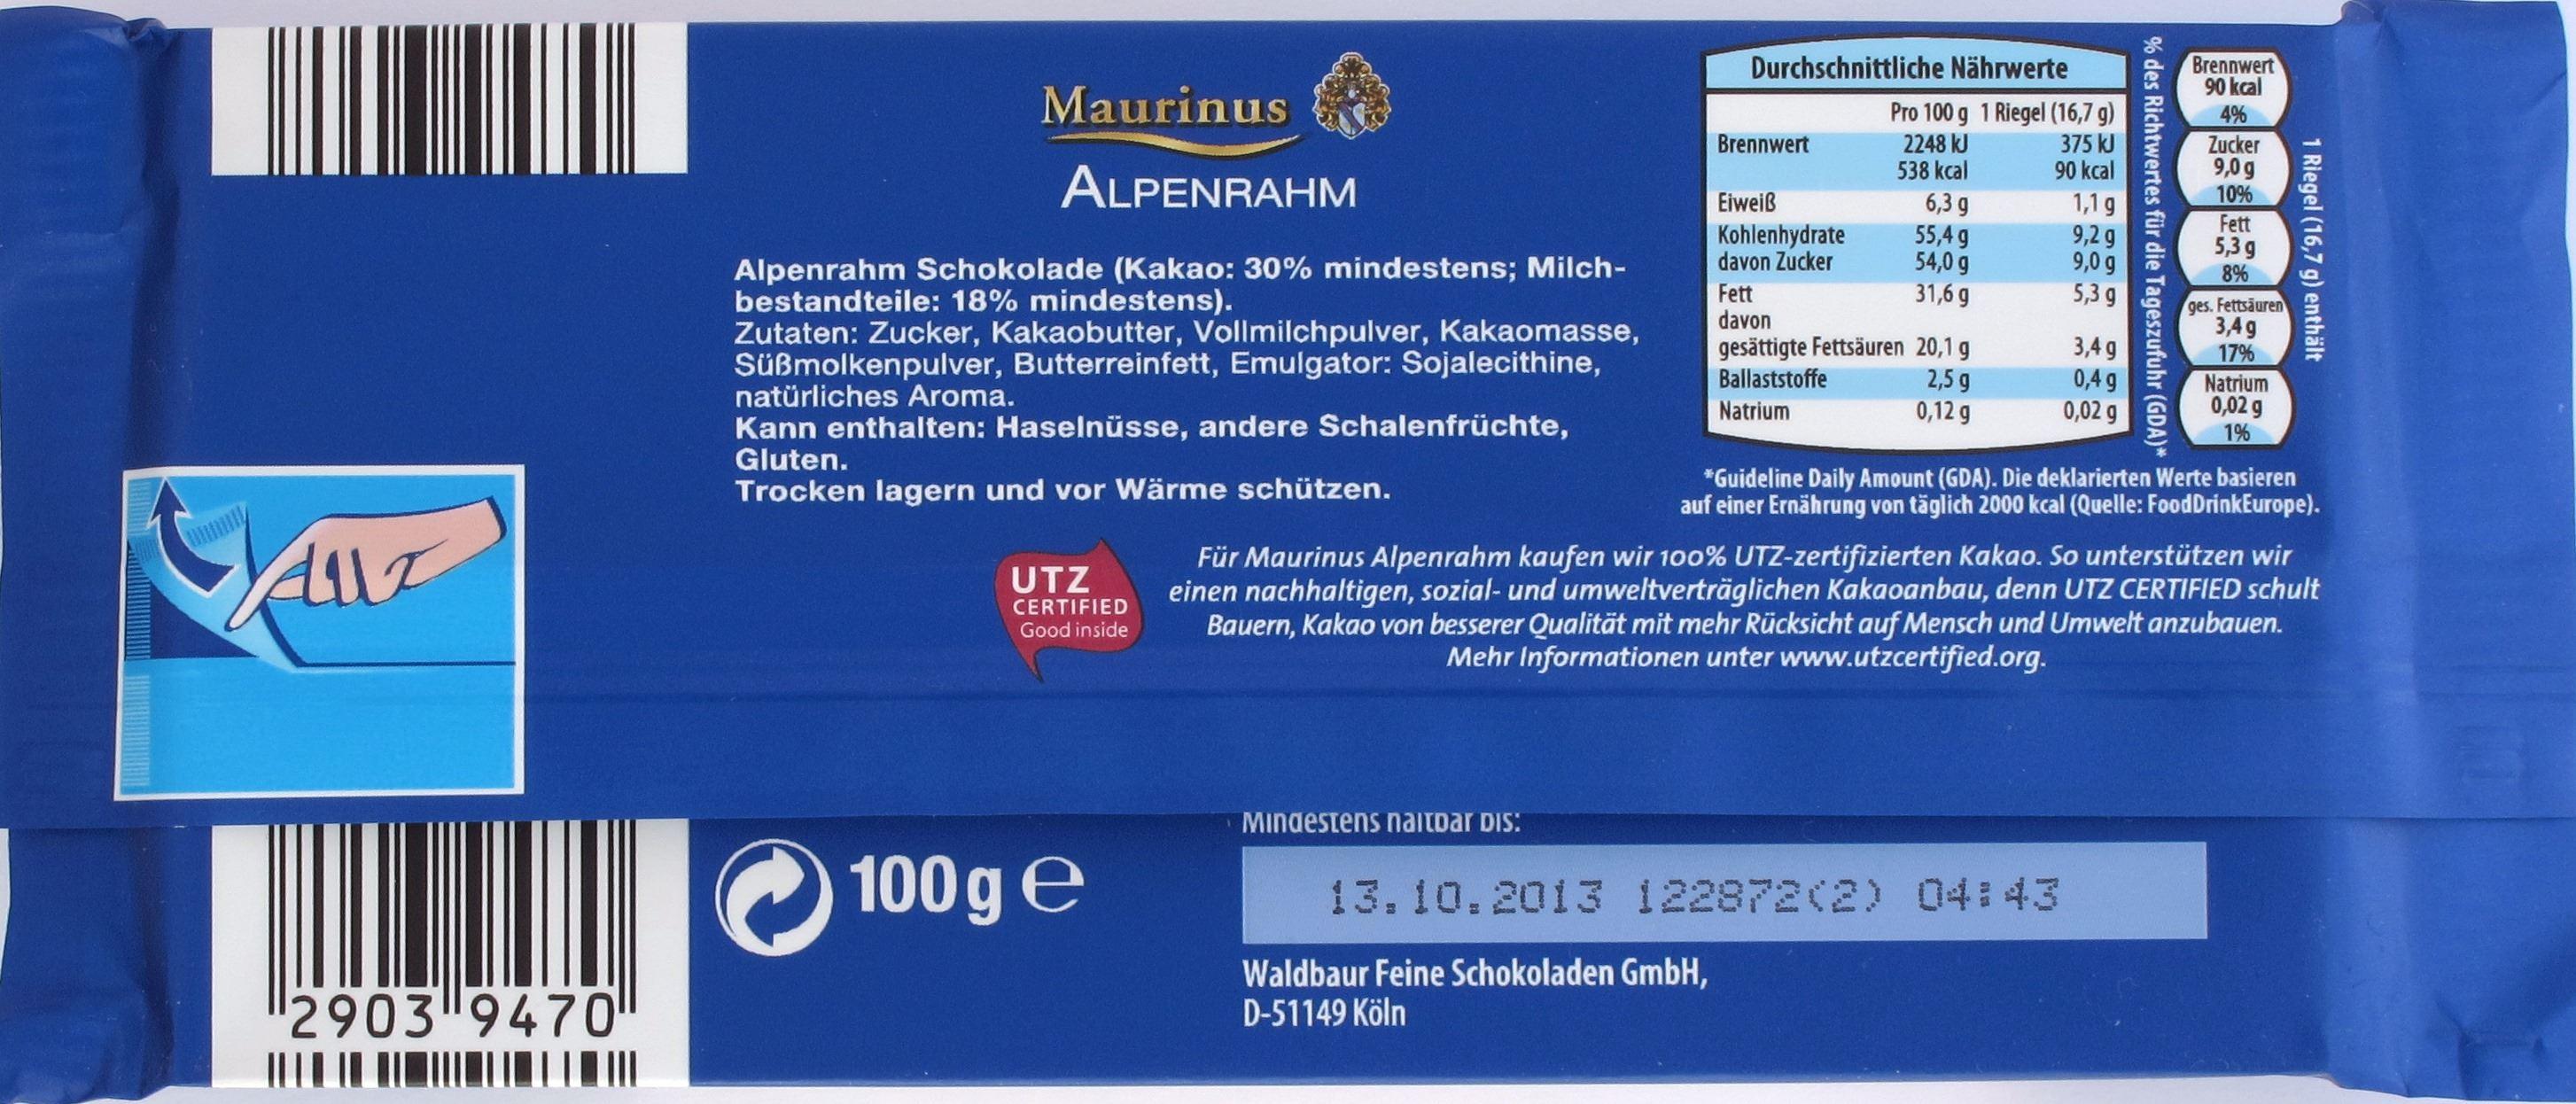 Maurinus/Aldi Milchschokolade 30% - Rückseite